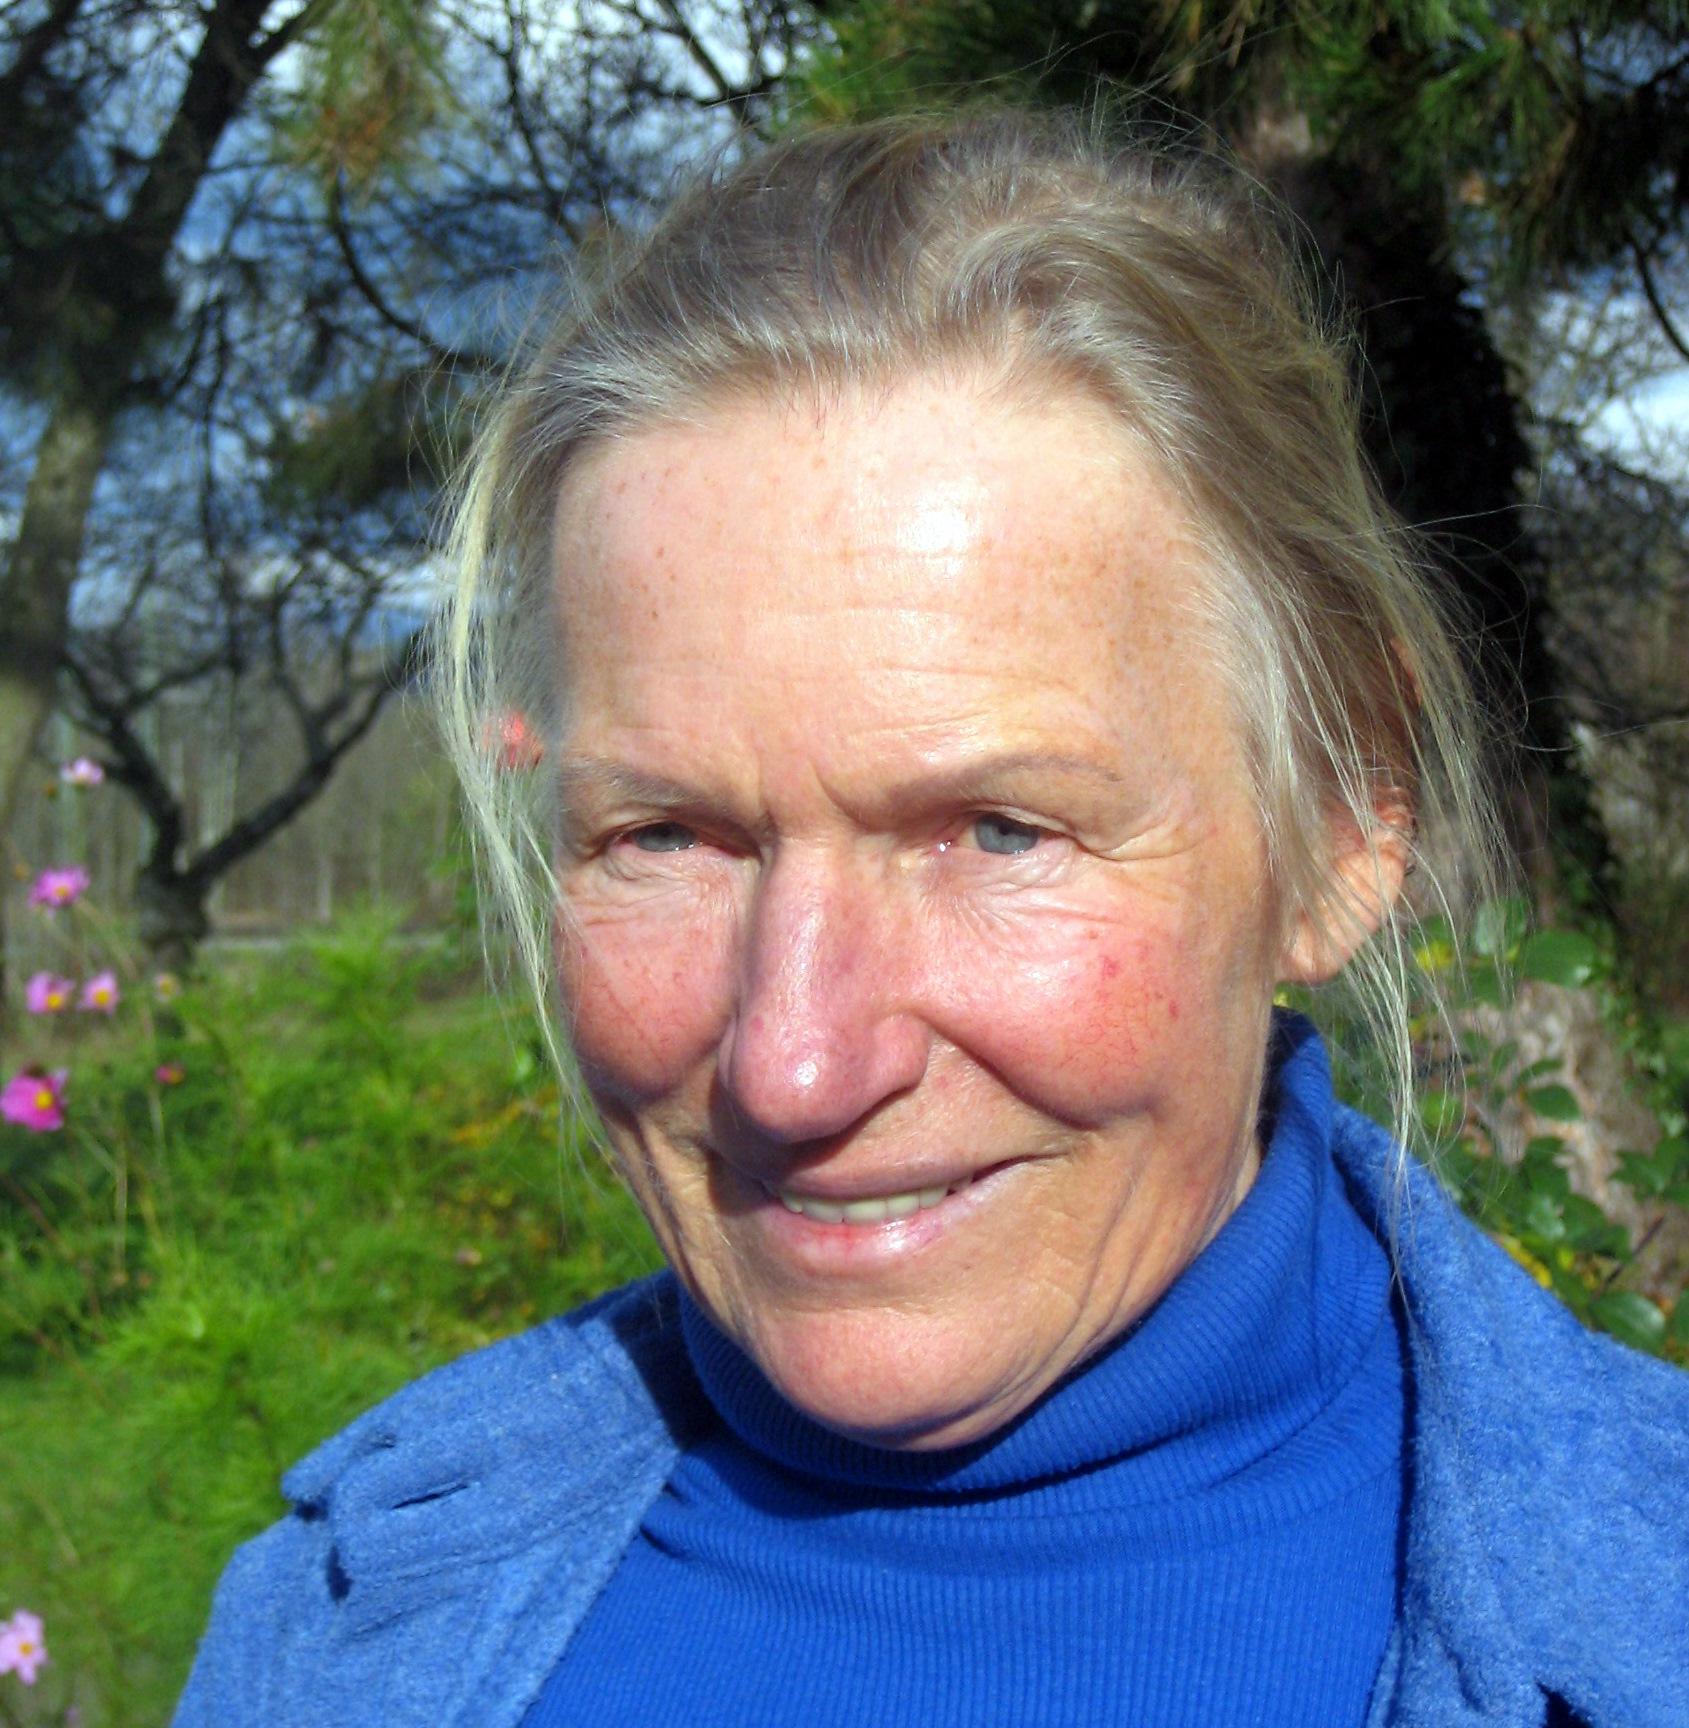 Kerstin Elisabeth Kaiser